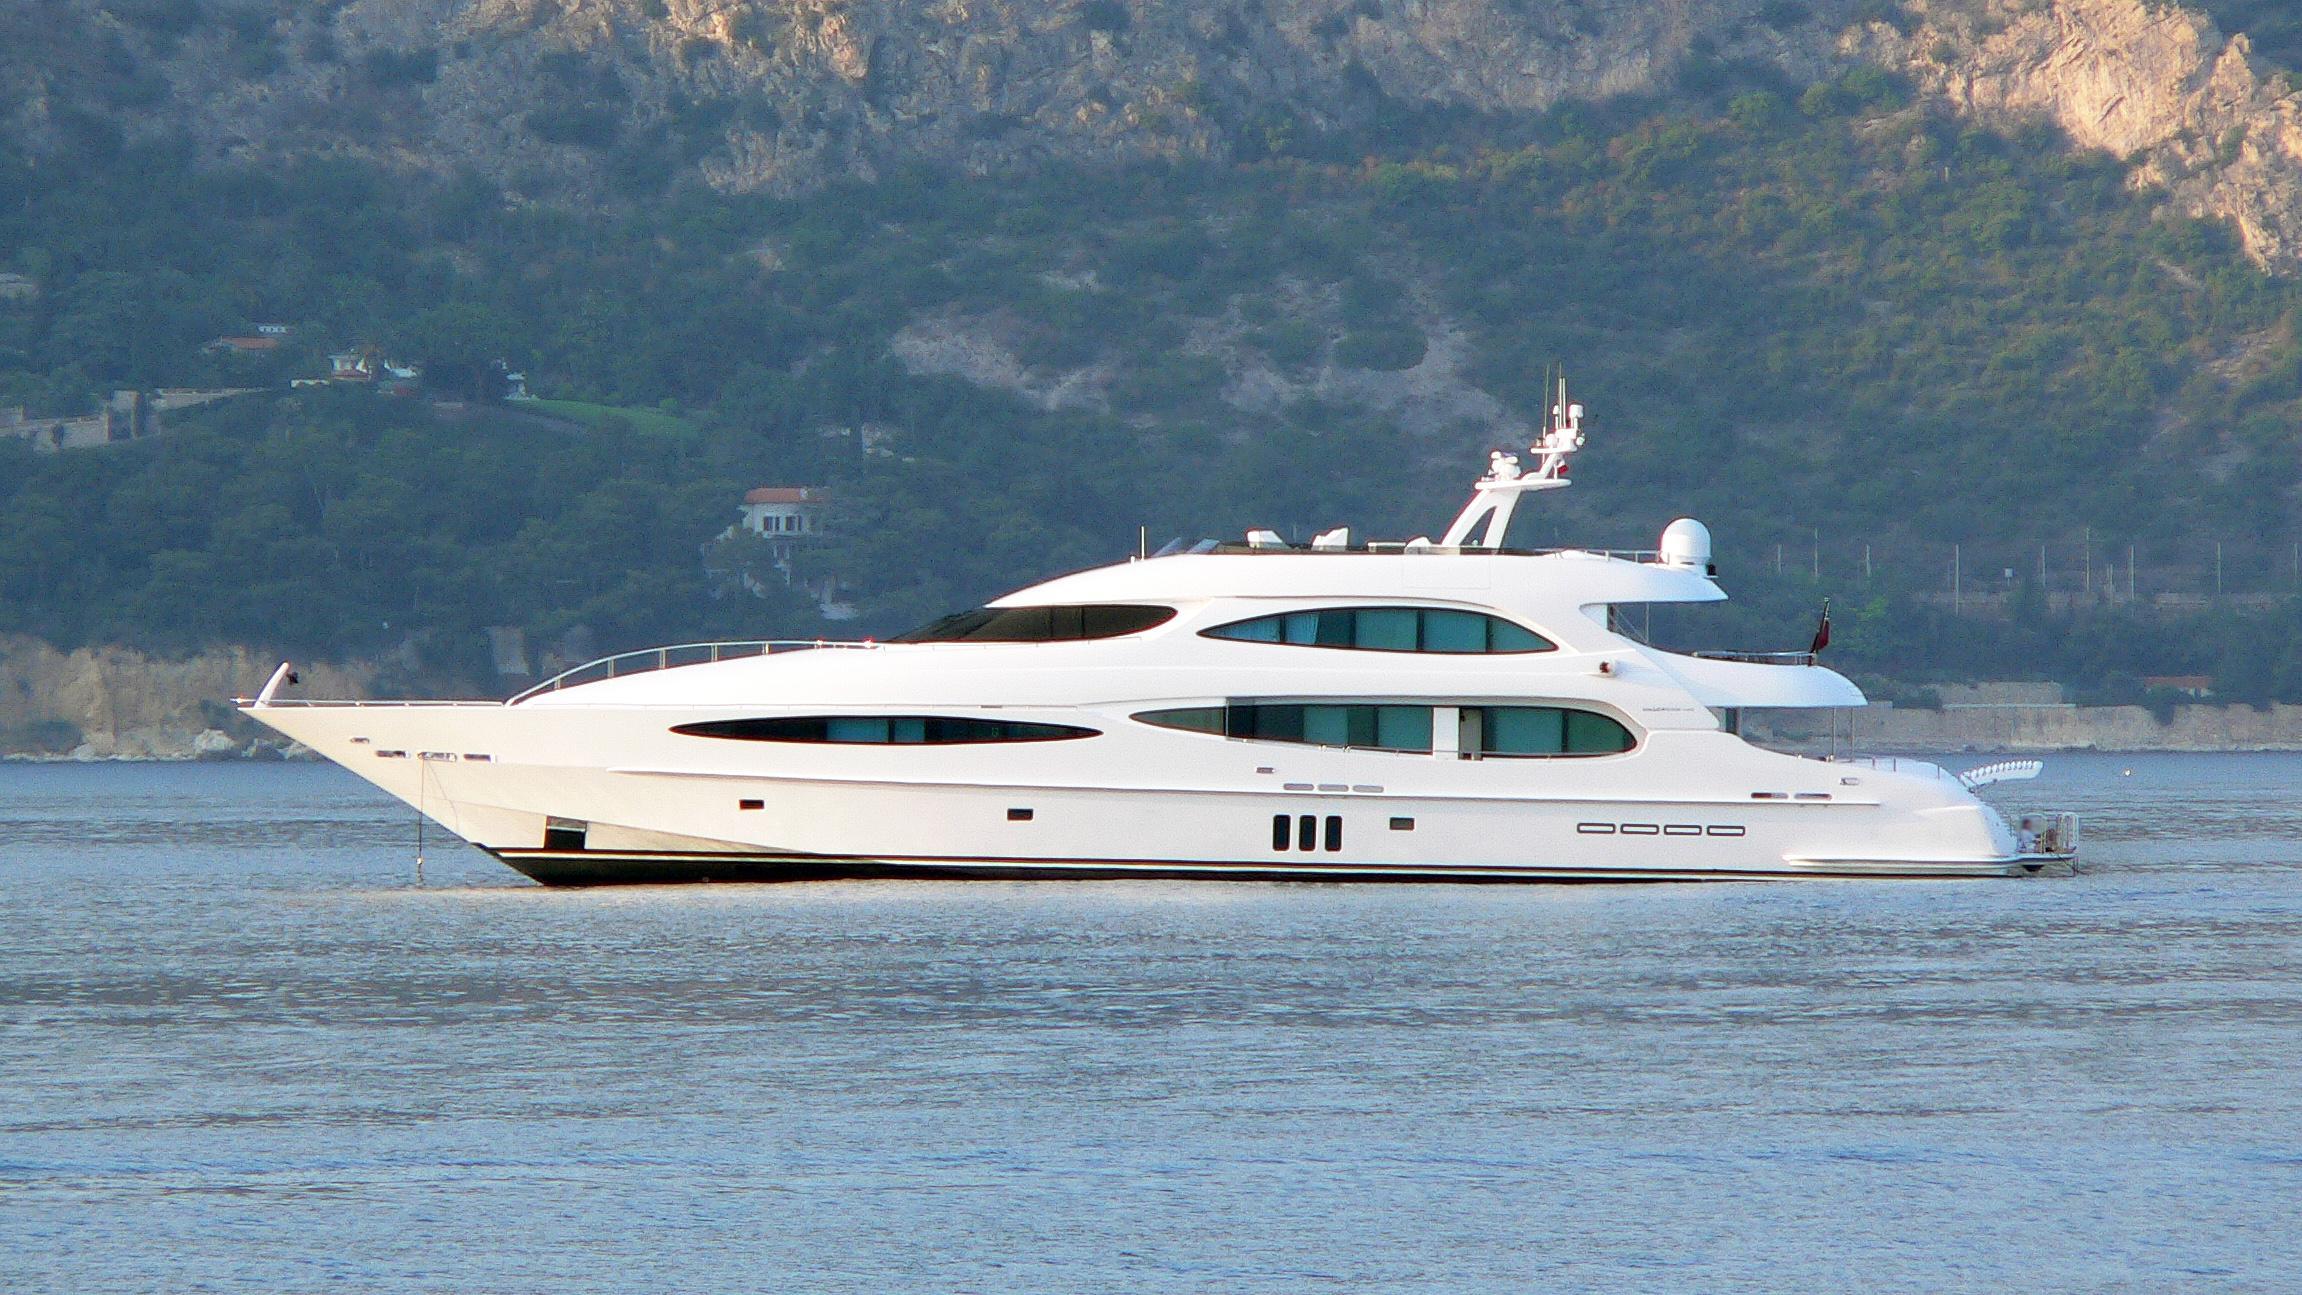 world-is-not-enough-motor-yacht-neptunus-millenium-140-2004-42m-profile-before-refit